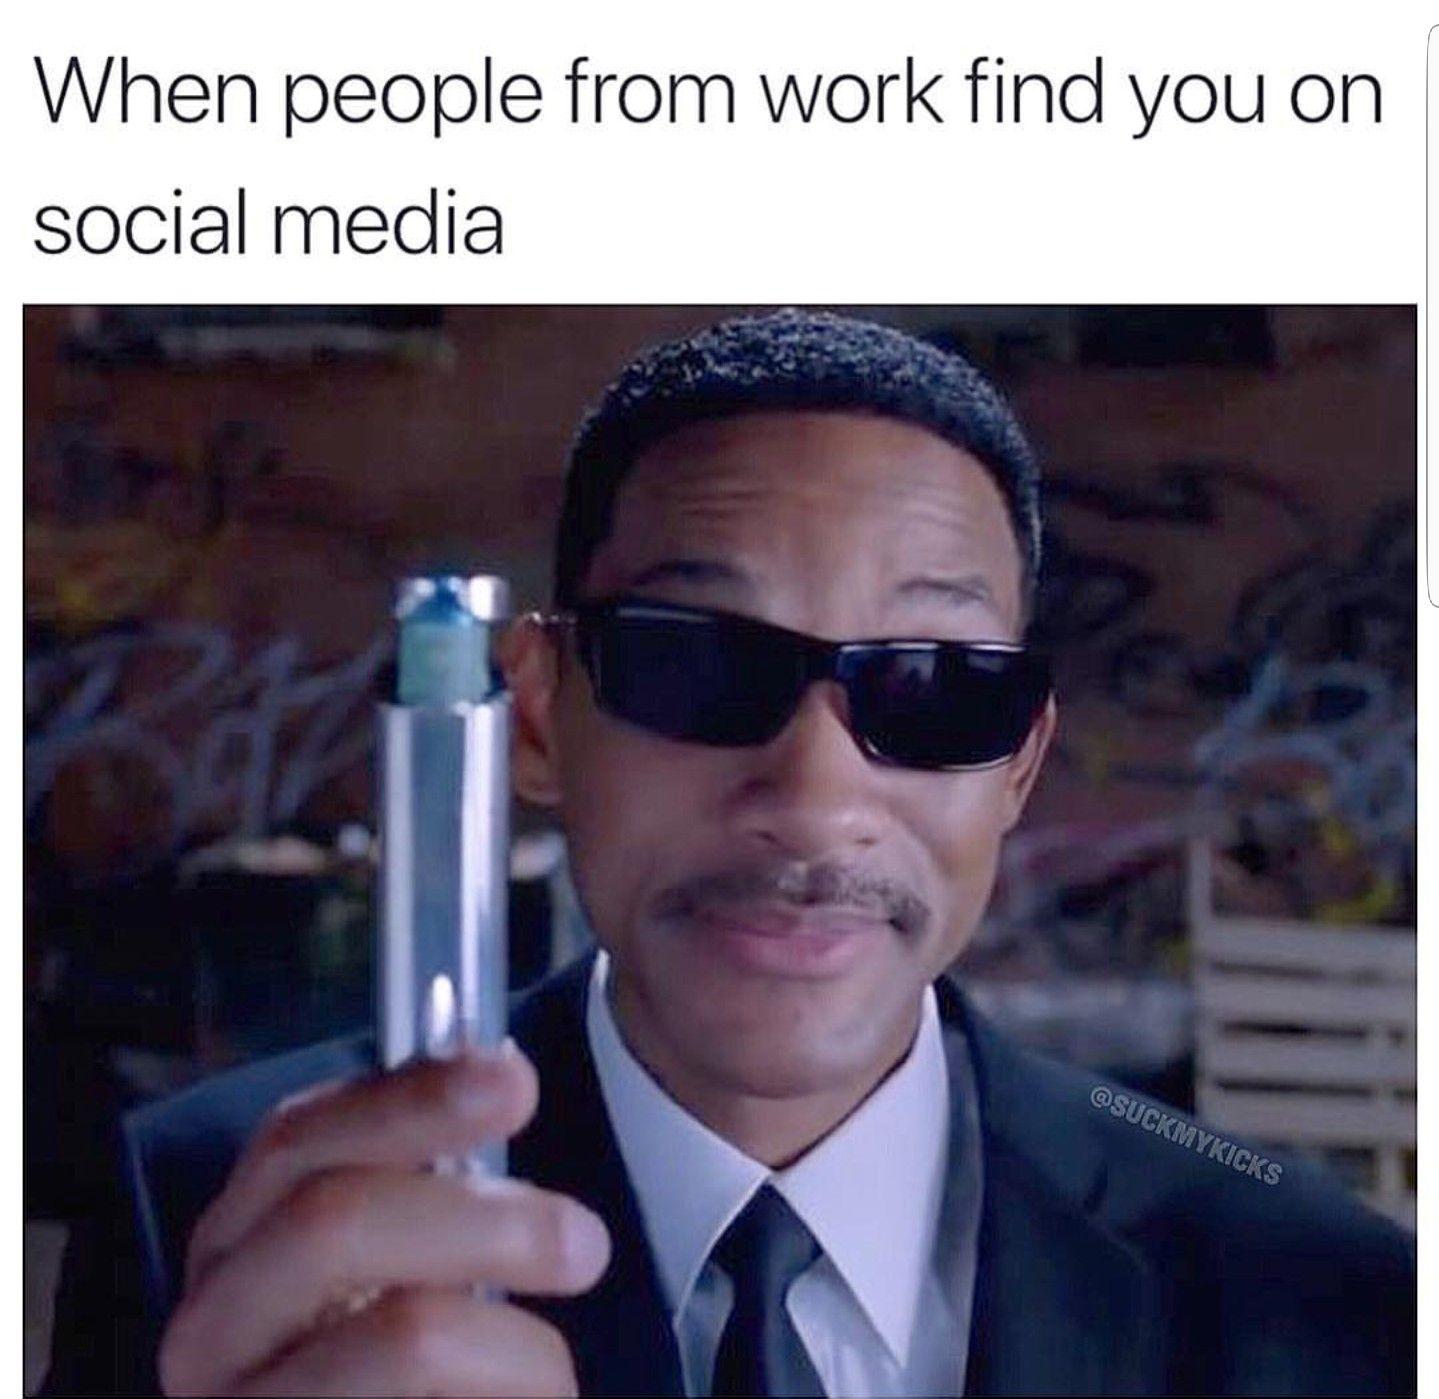 Repin By At Social Media Marketing Pinterest Marketing Specialists Atsocialmedia Co Uk Best Funny Photos Funny Photos Social Media Meme